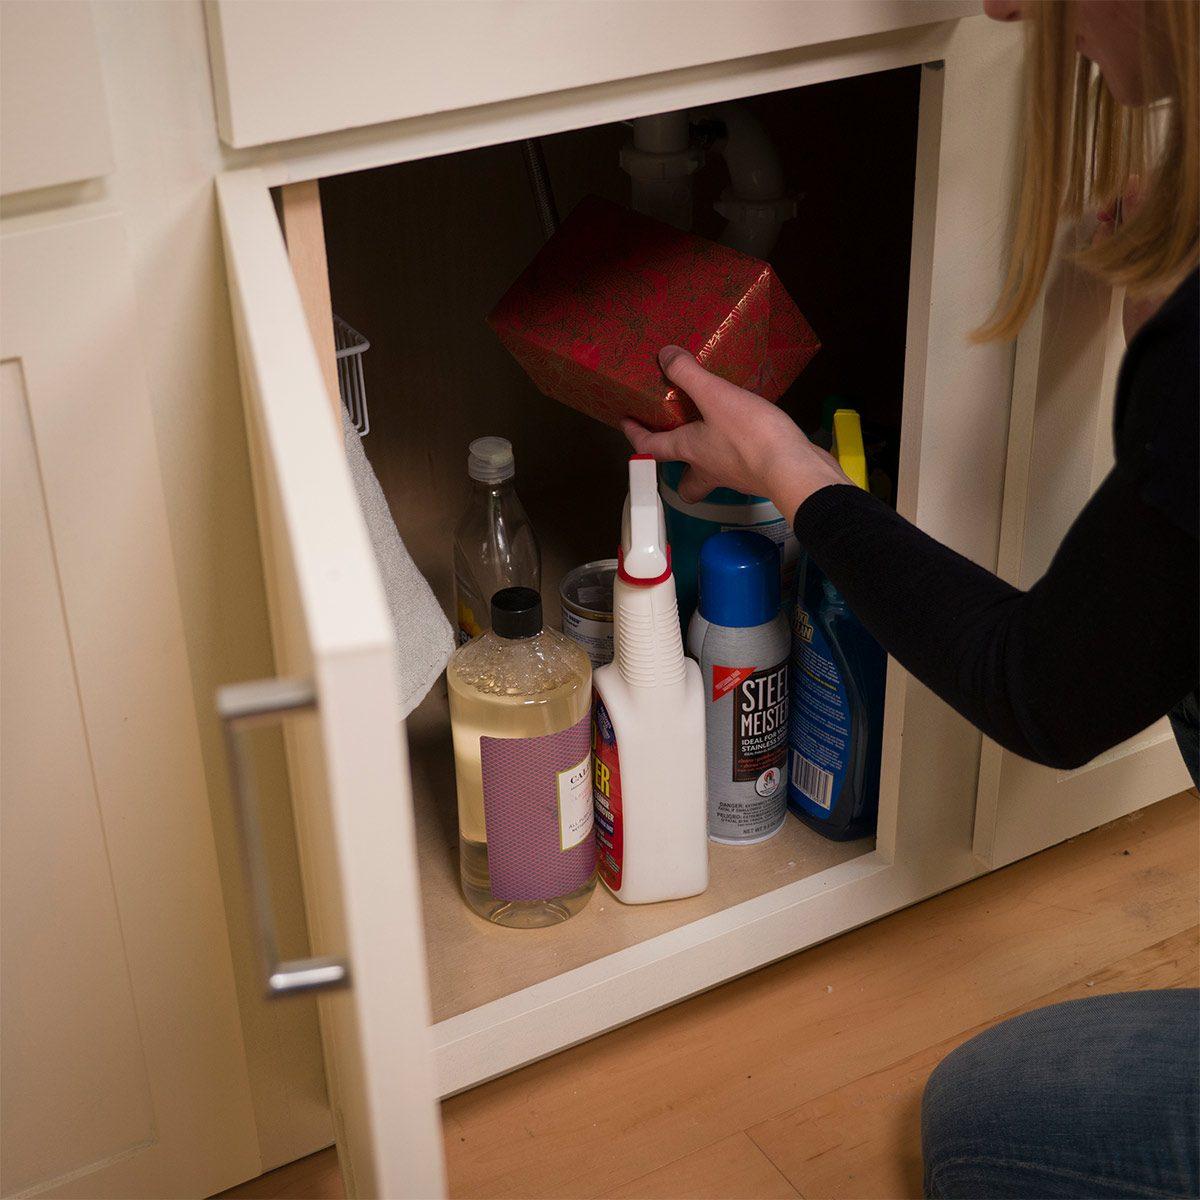 hiding gift under sink behind cleaning supplies